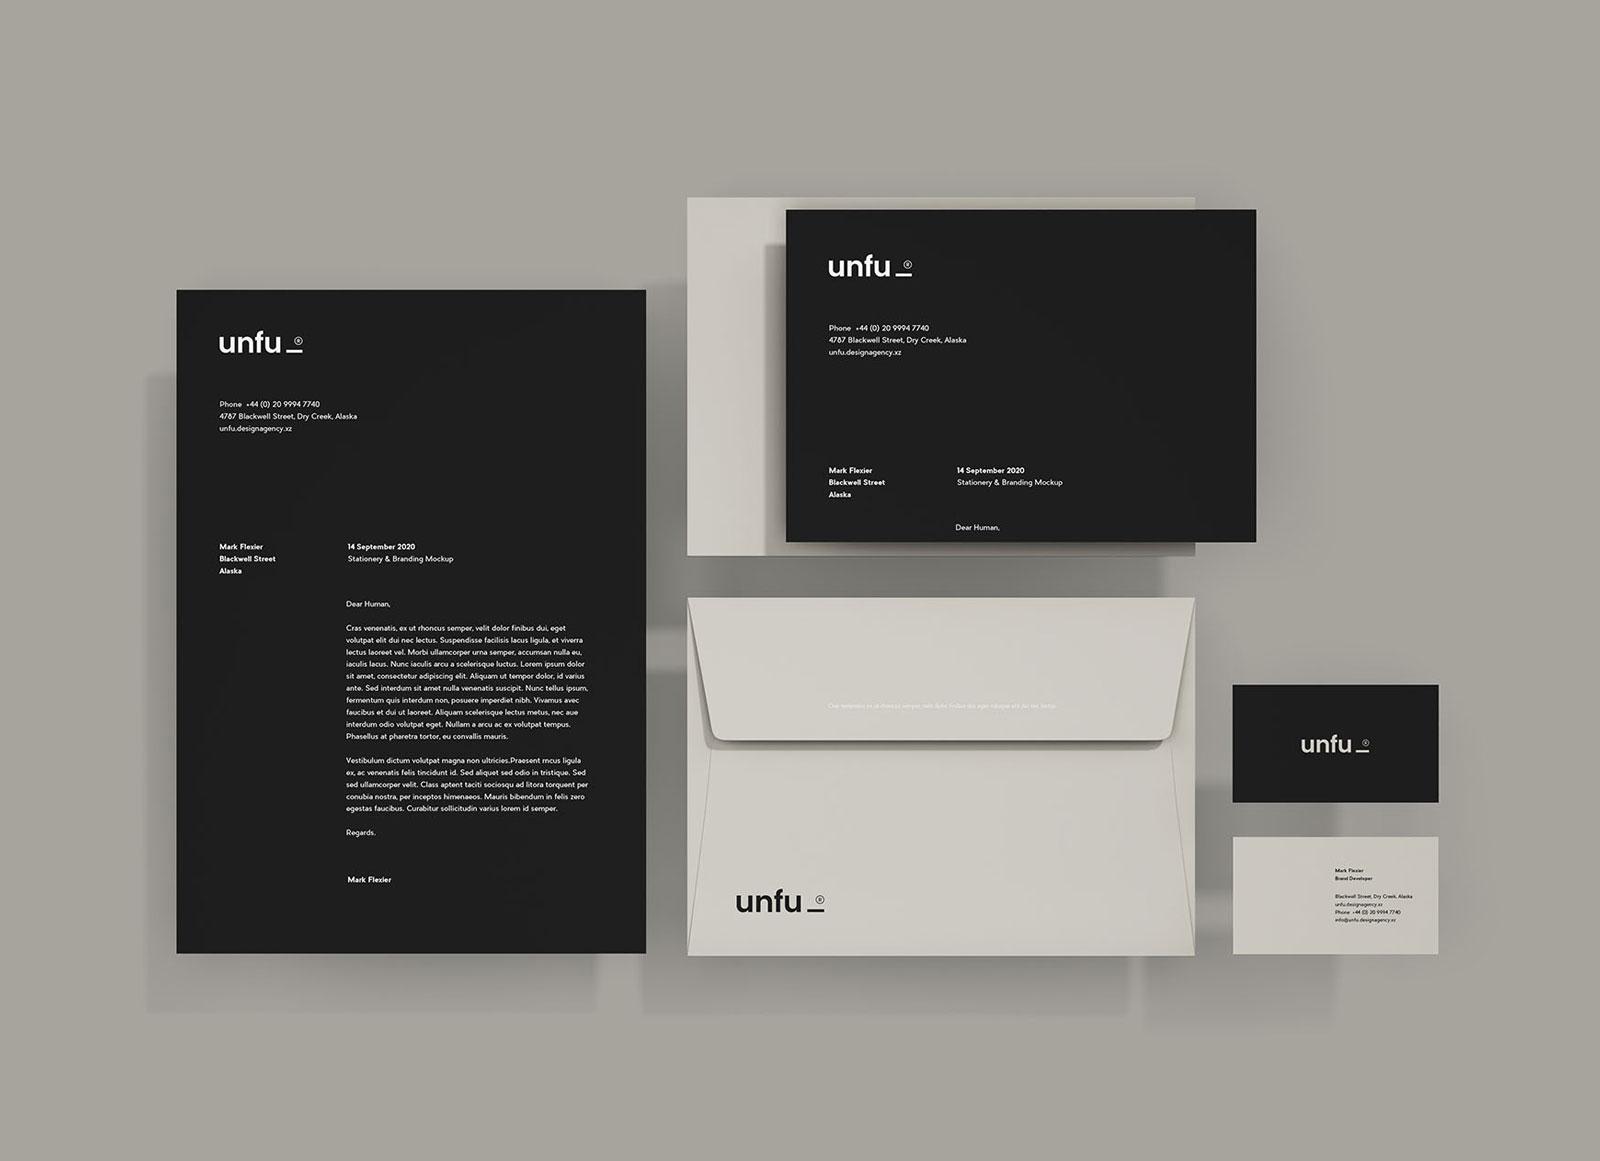 Free-Simple-Branding-Stationery-Mockup-PSD-2